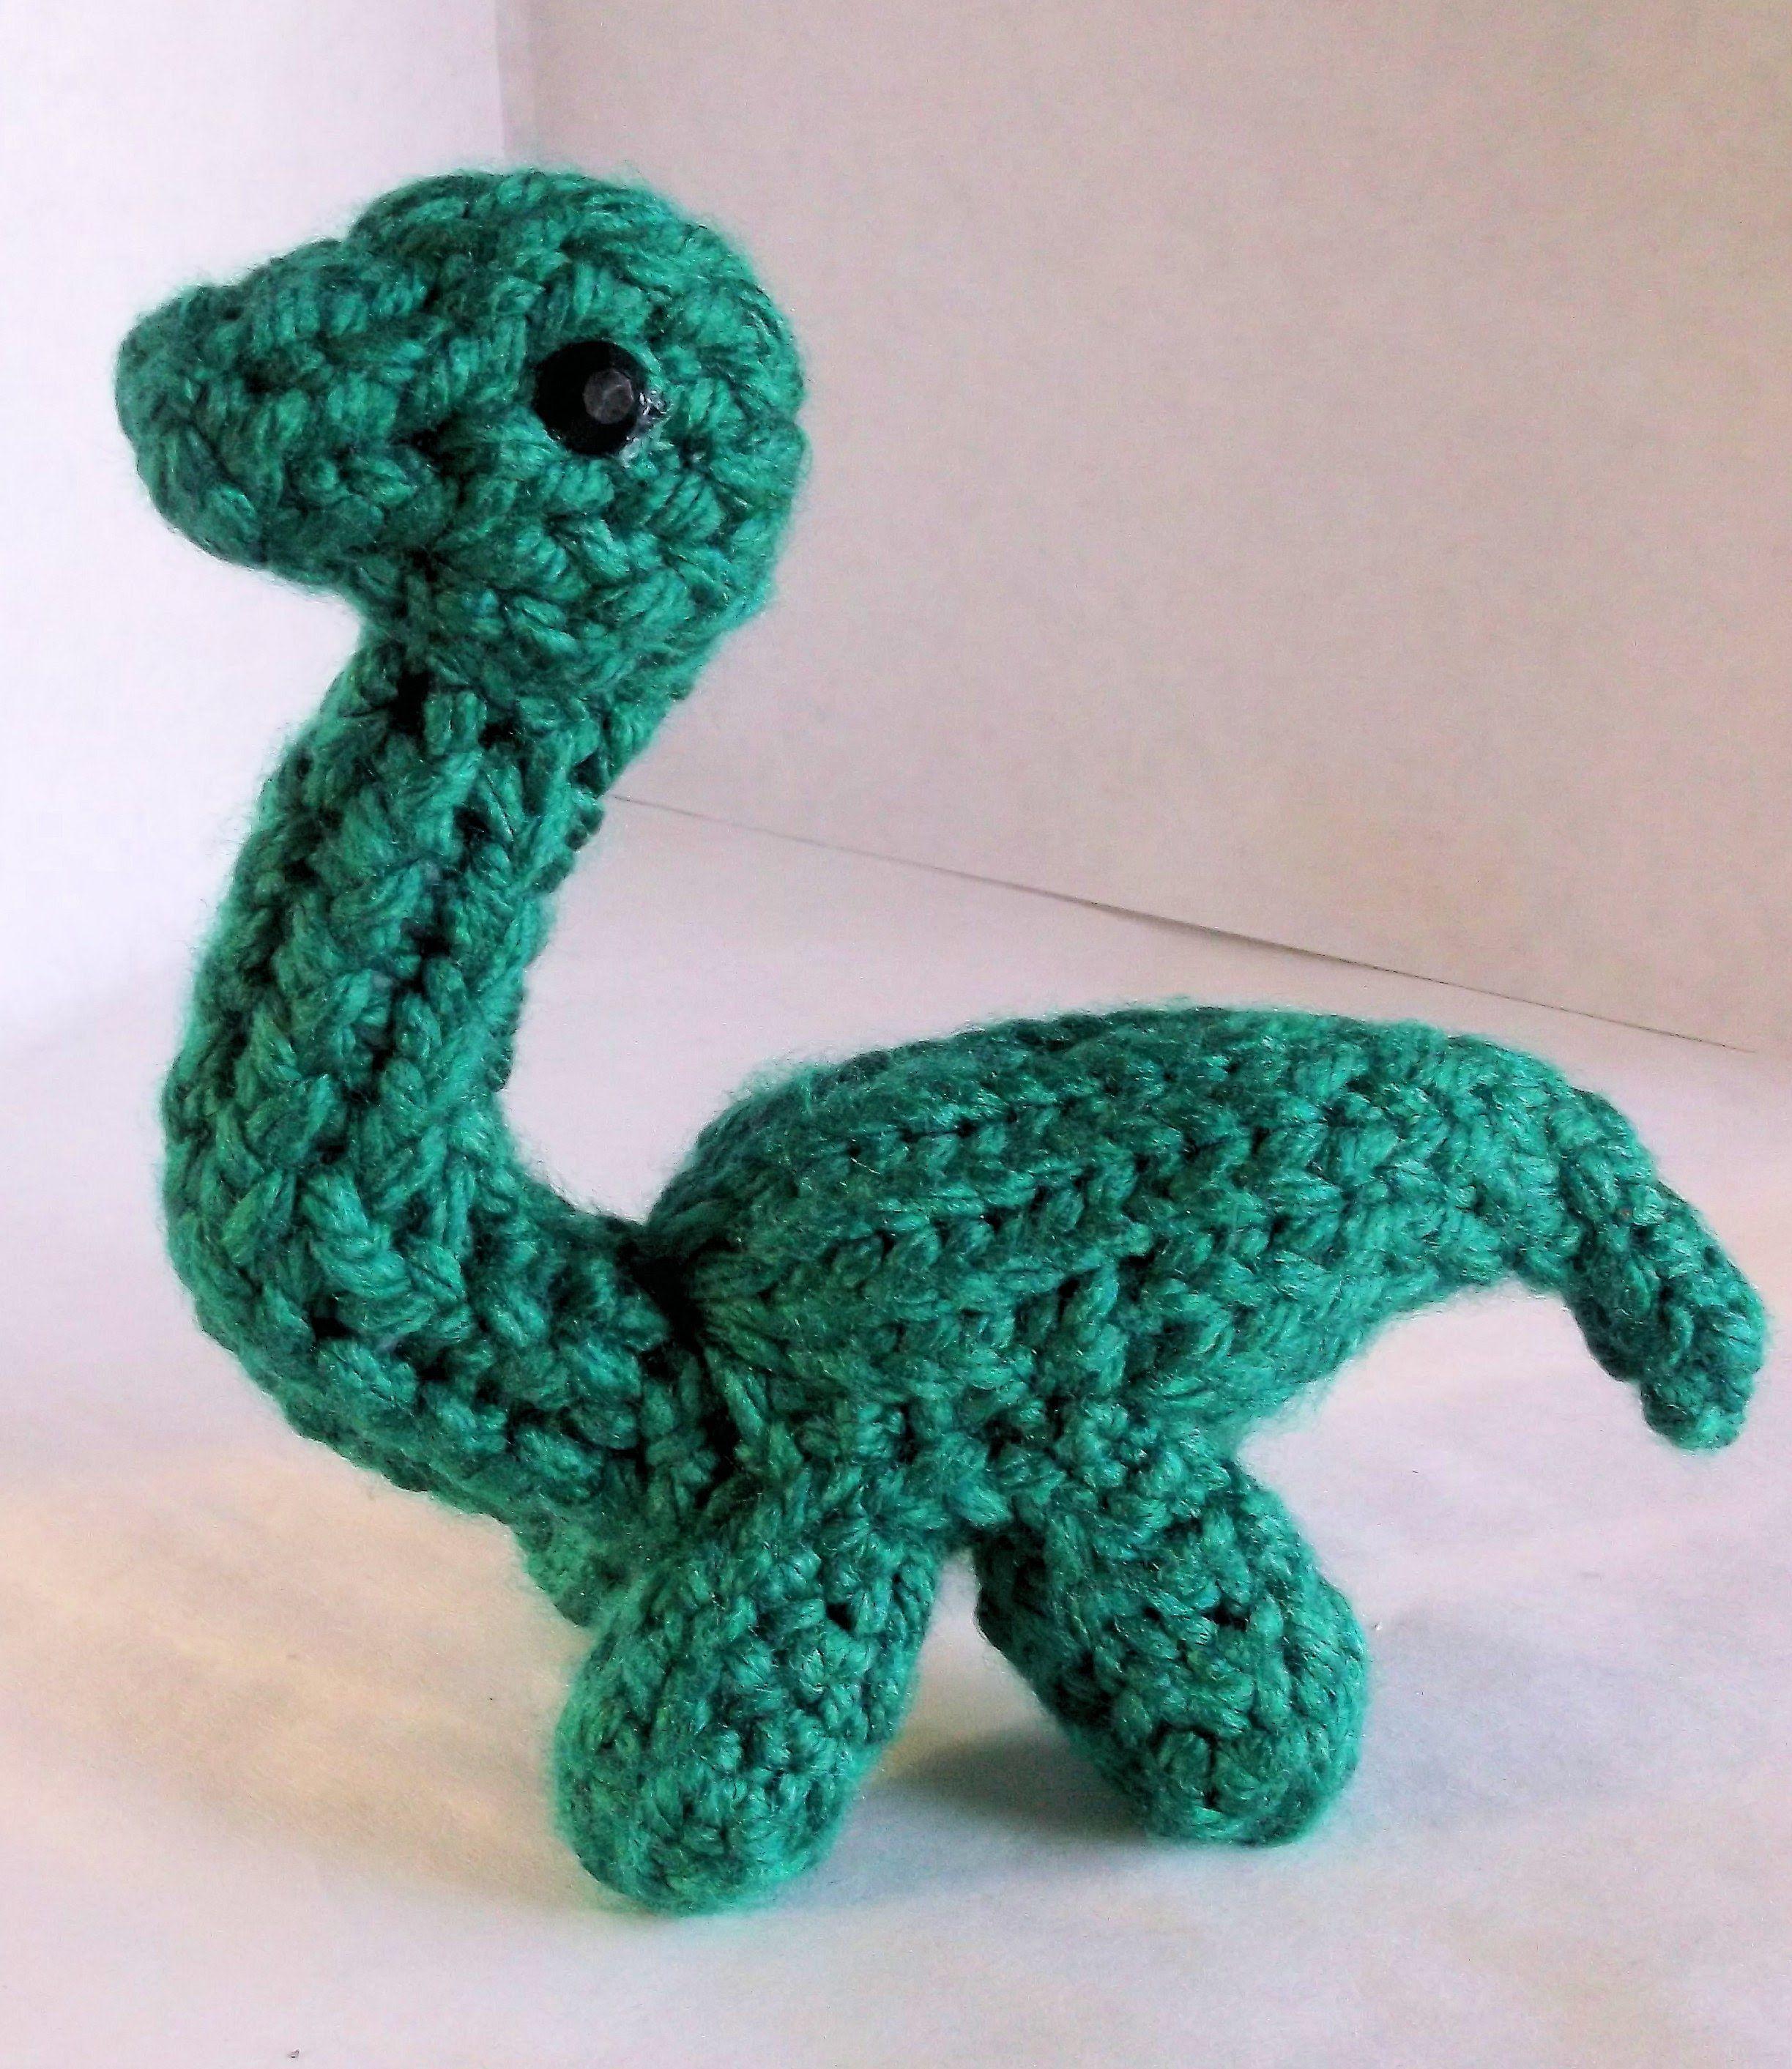 How to Loom Knit a Dinosaur | Loom knitting projects, Loom ...